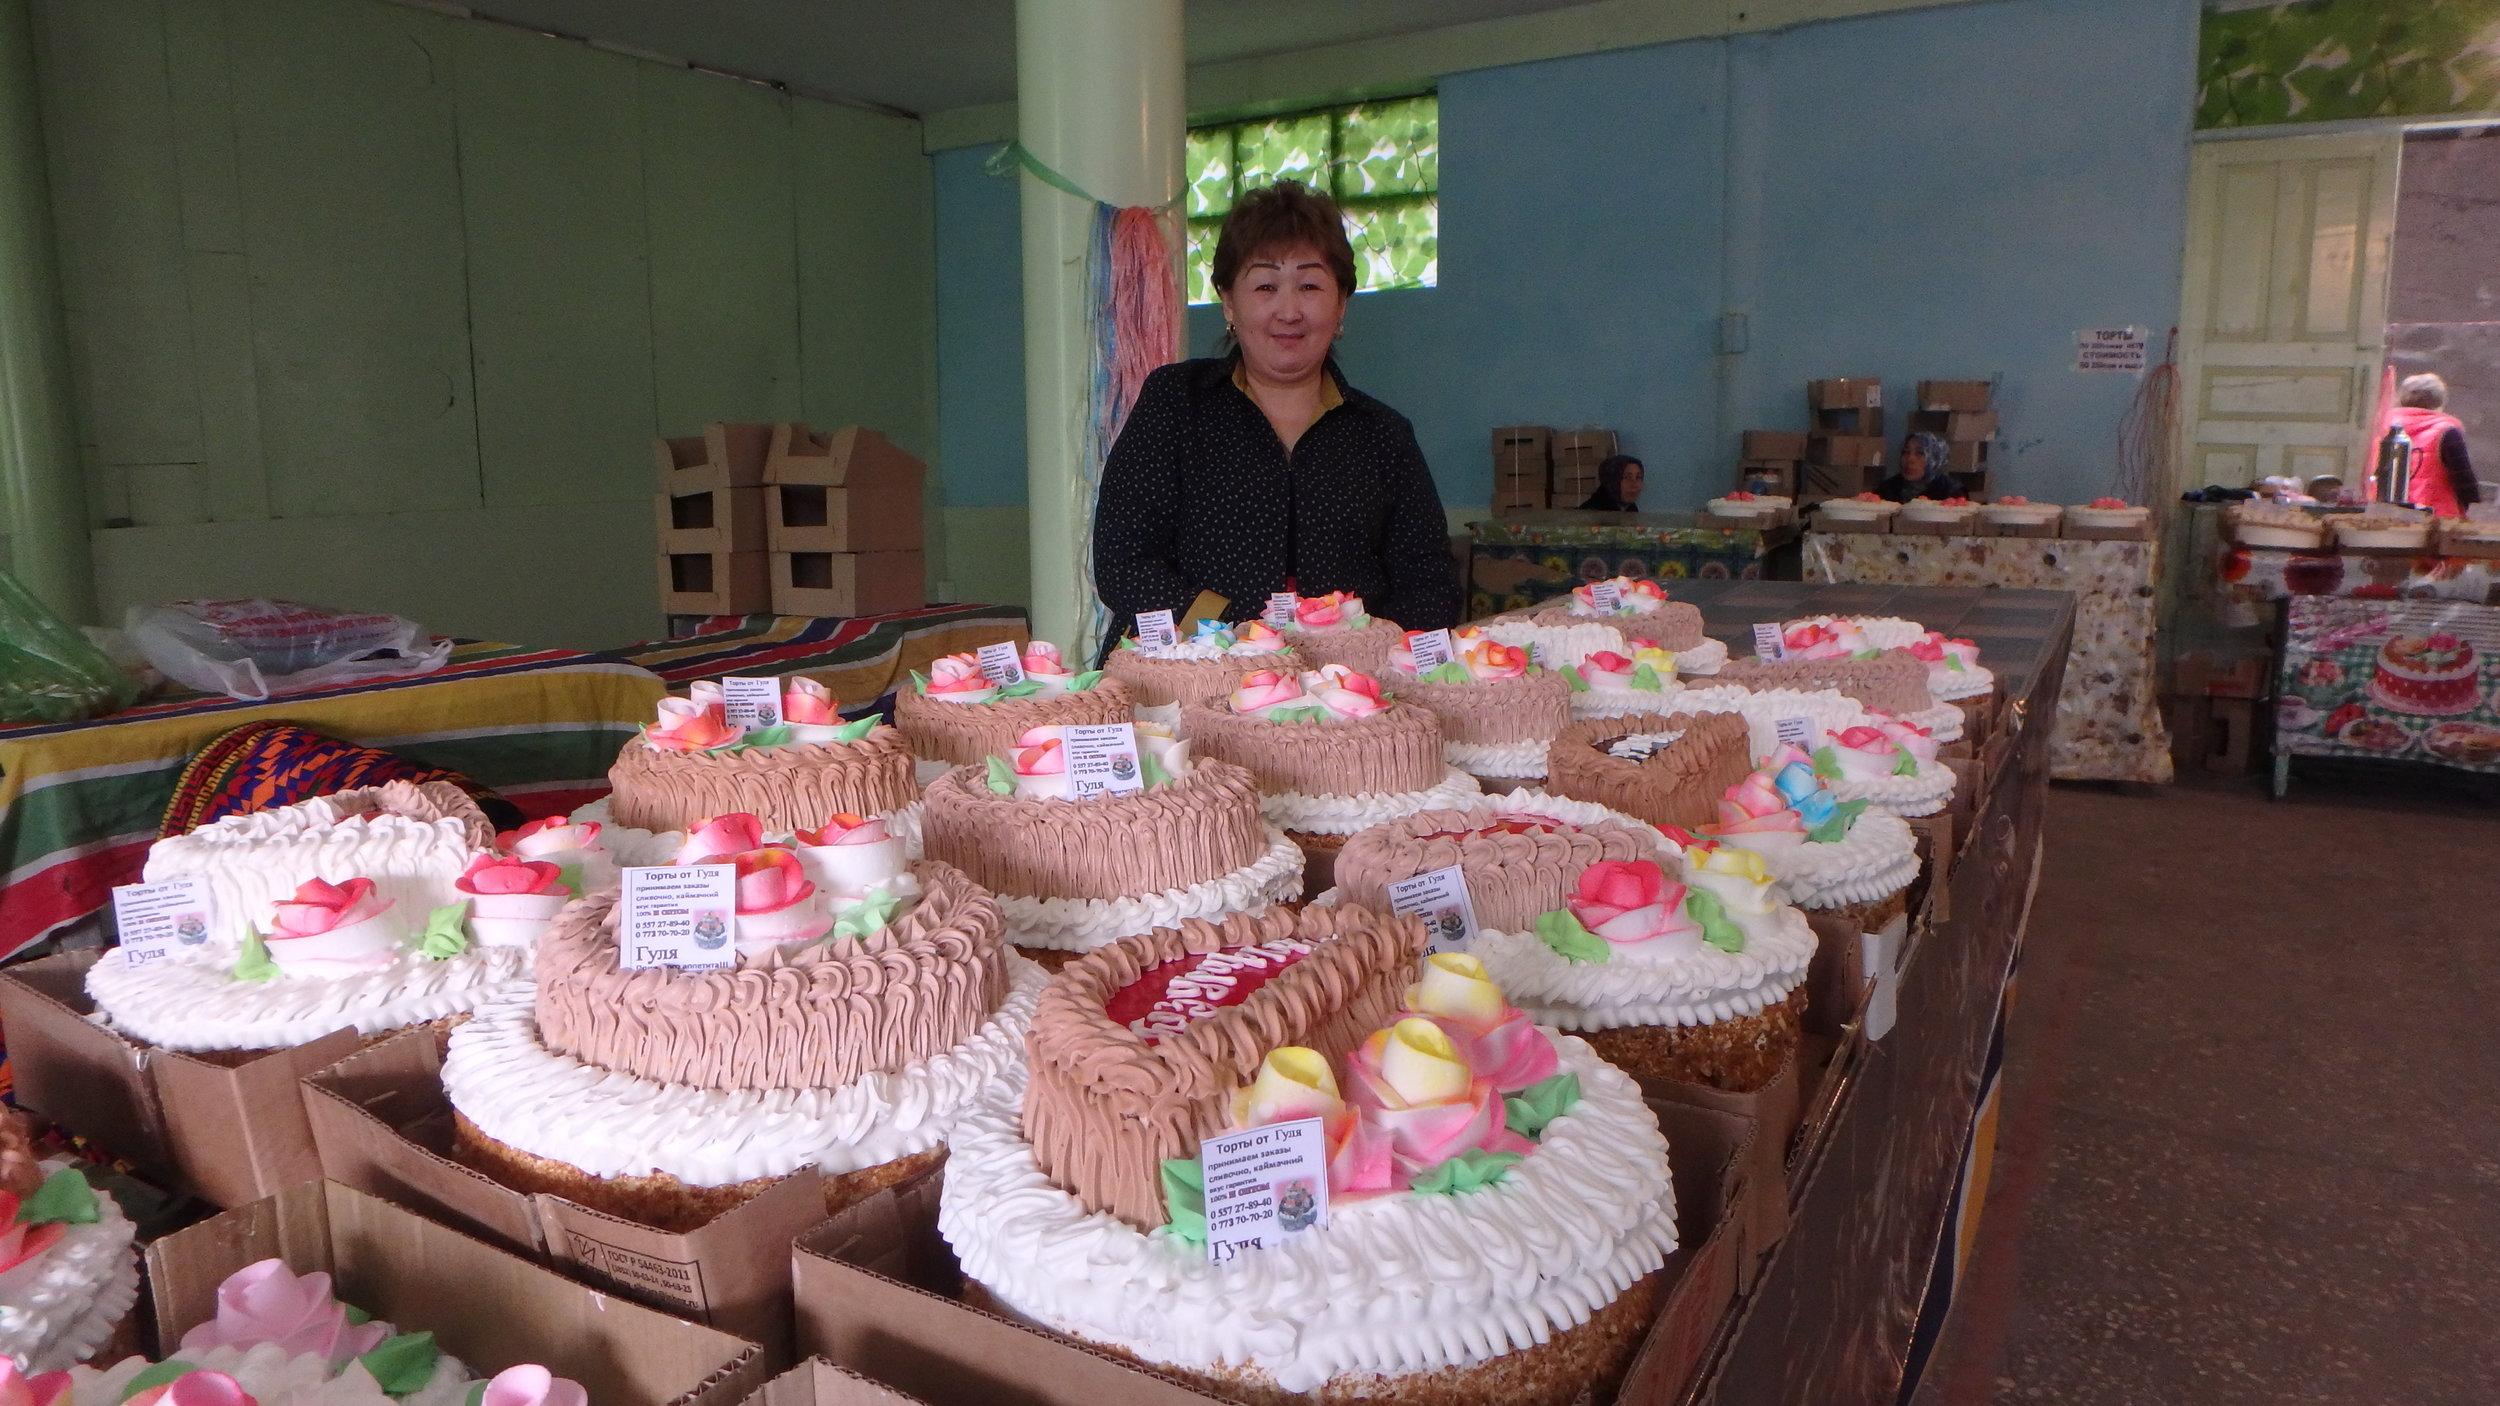 Cake section, Osh bazaar (in Osh, not Bishkek).